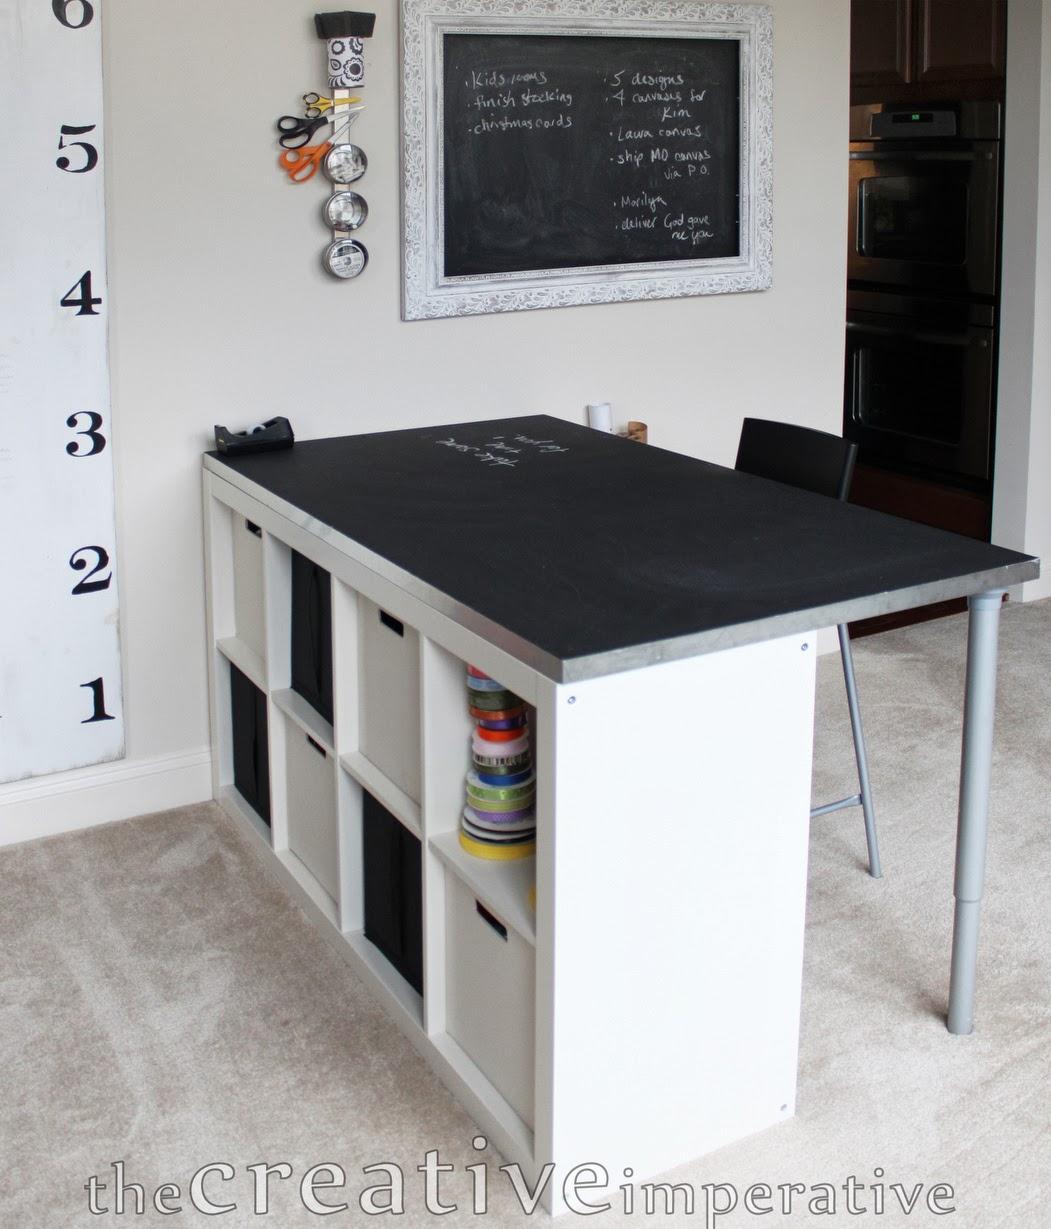 Boiserie c tavoli e scrittoi fai da te 15 idee - Crea cucina ikea ...